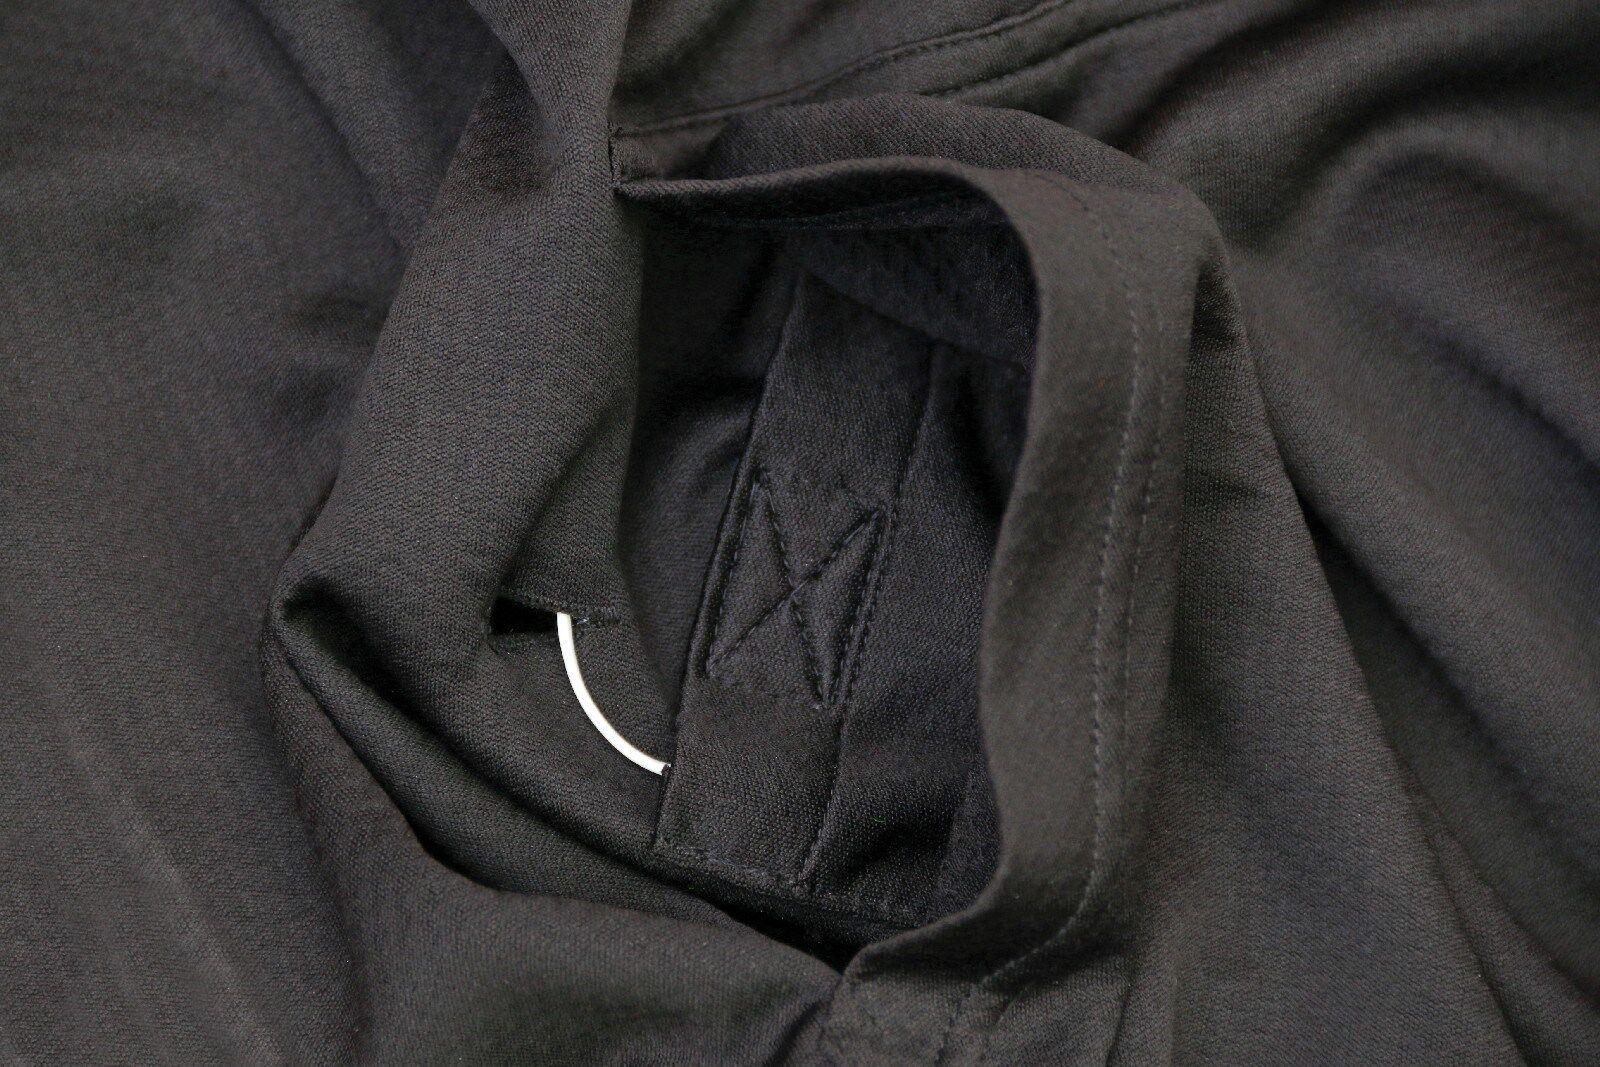 Cat Caterpillar Wächter Hoodie Herren 1 4 4 4 Reißverschluss Arbeitskleidung 7aa988